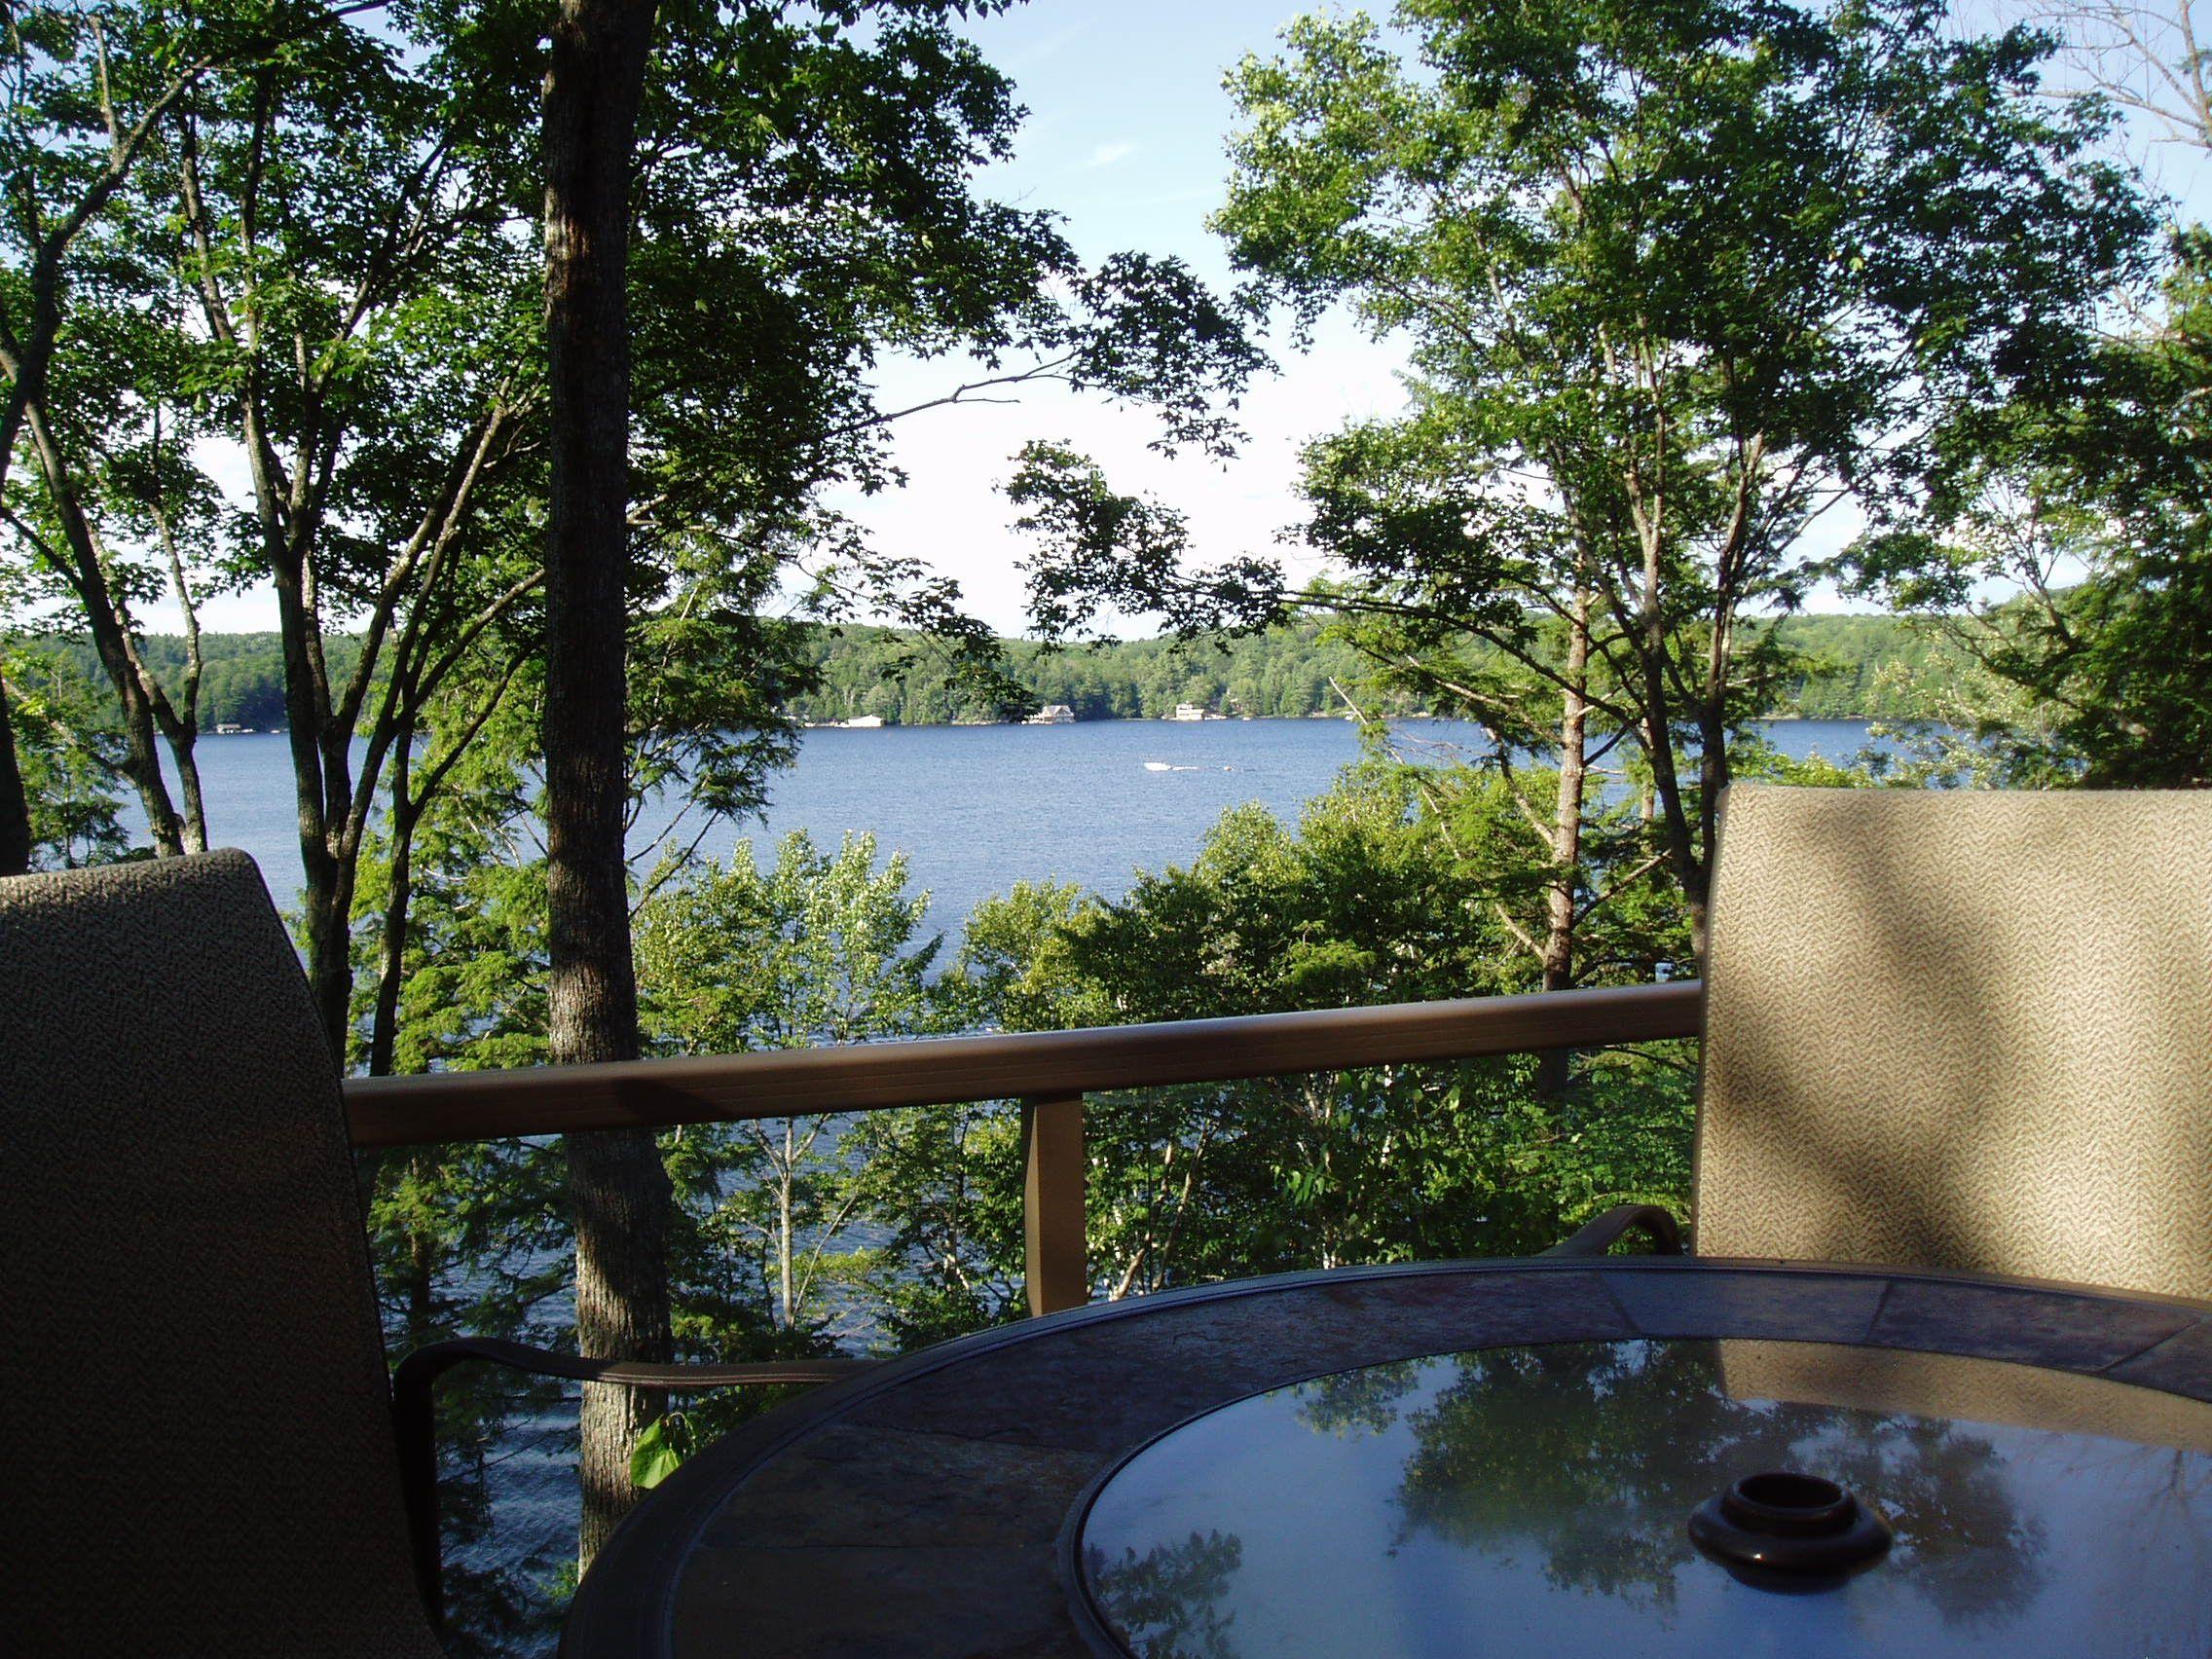 cottage by awaits muskoka whitepines vacation cottages your rentals marlene unforgettable